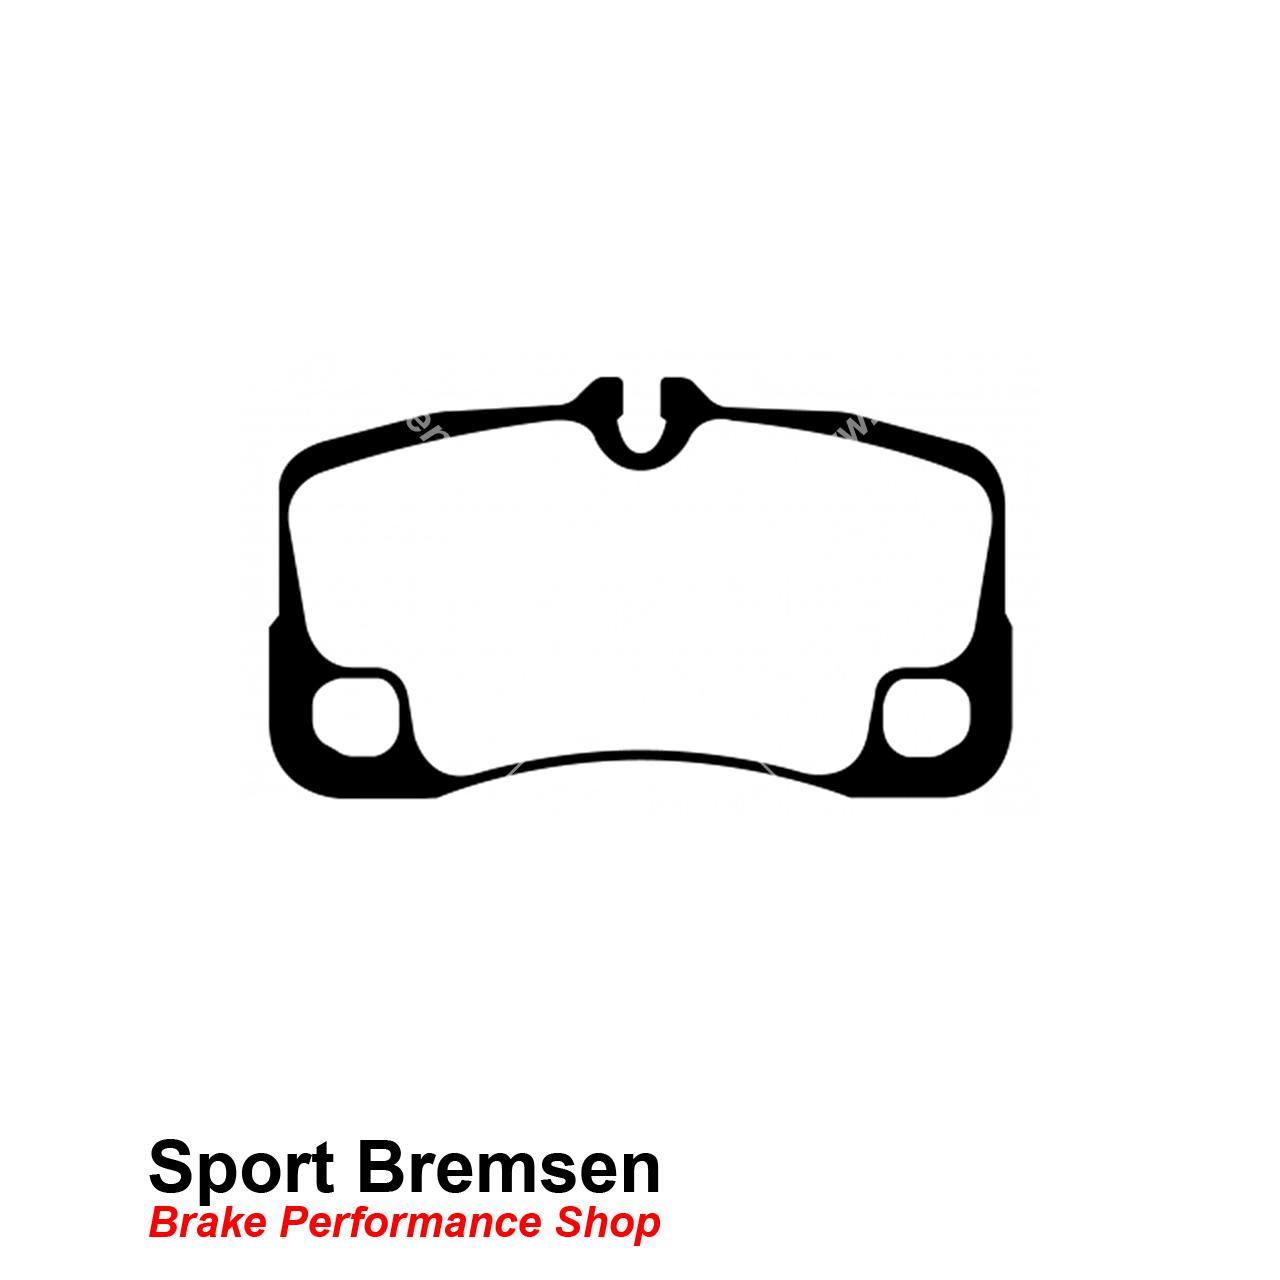 Ebc Redstuff Keramik Bremsbelage Fur Porsche 911 Turbo 3 6